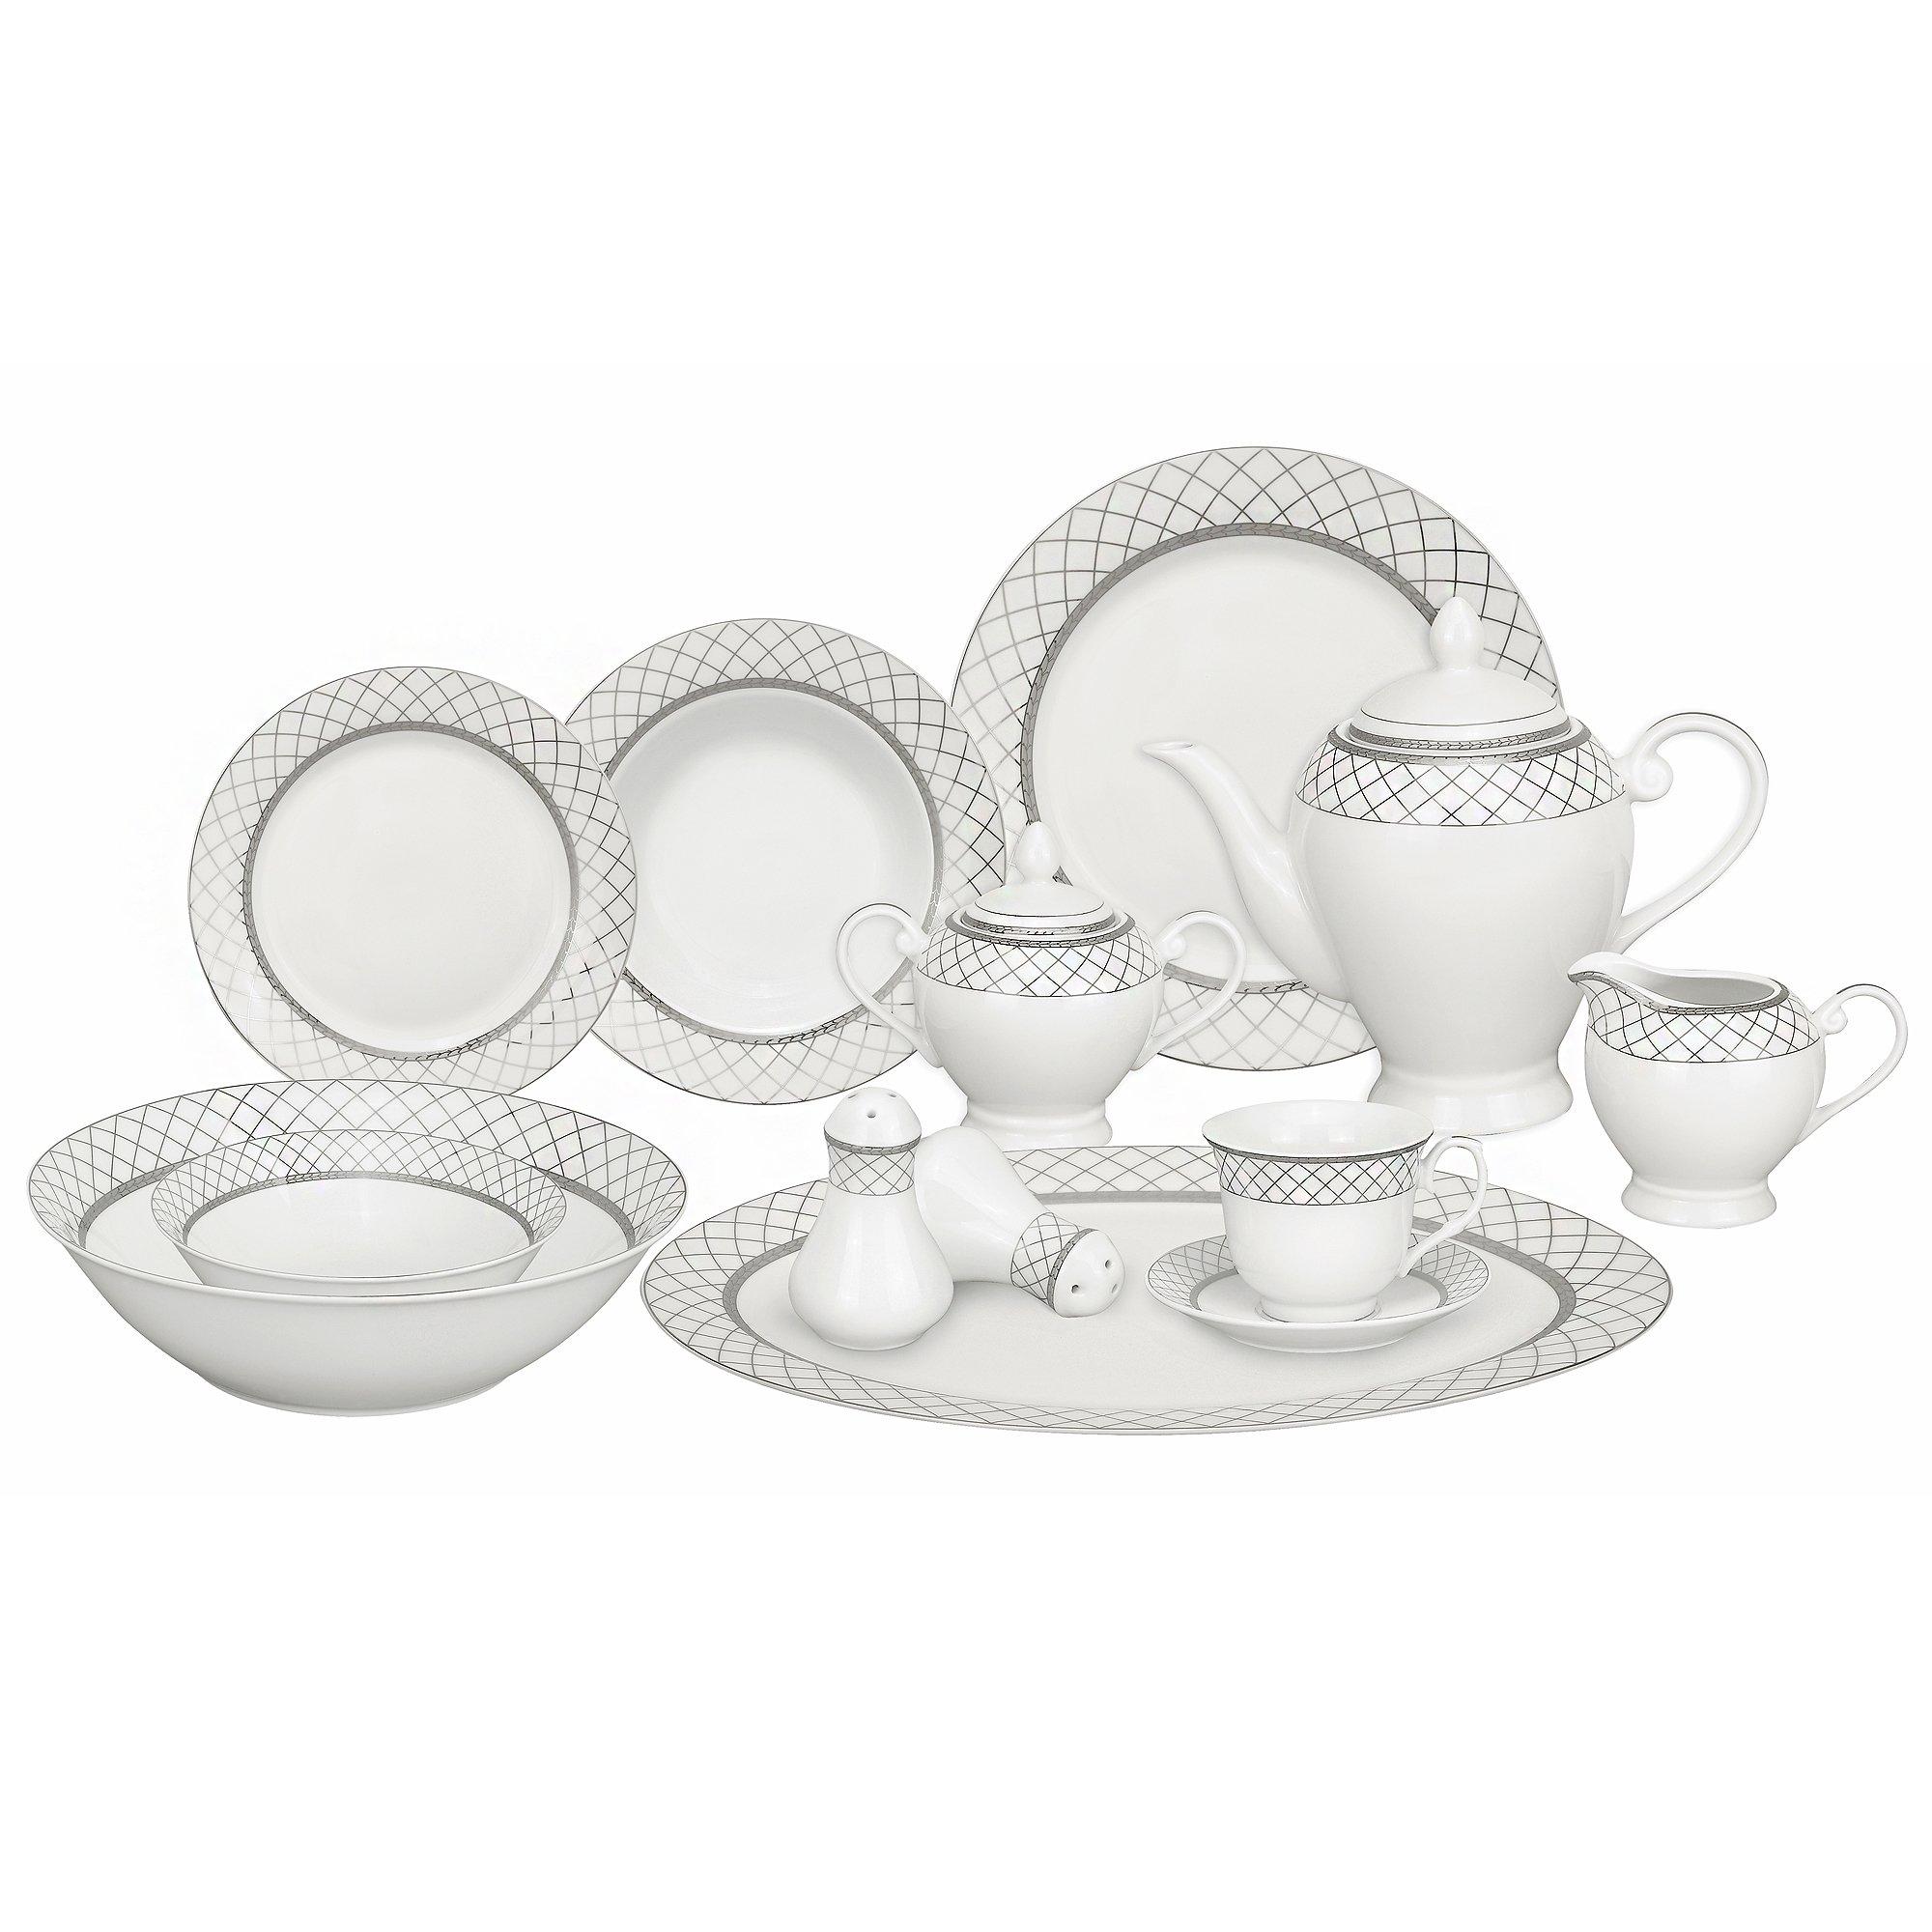 Lorren Home Trends 57-Piece Porcelain Dinnerware Set, Verona, Service for 8